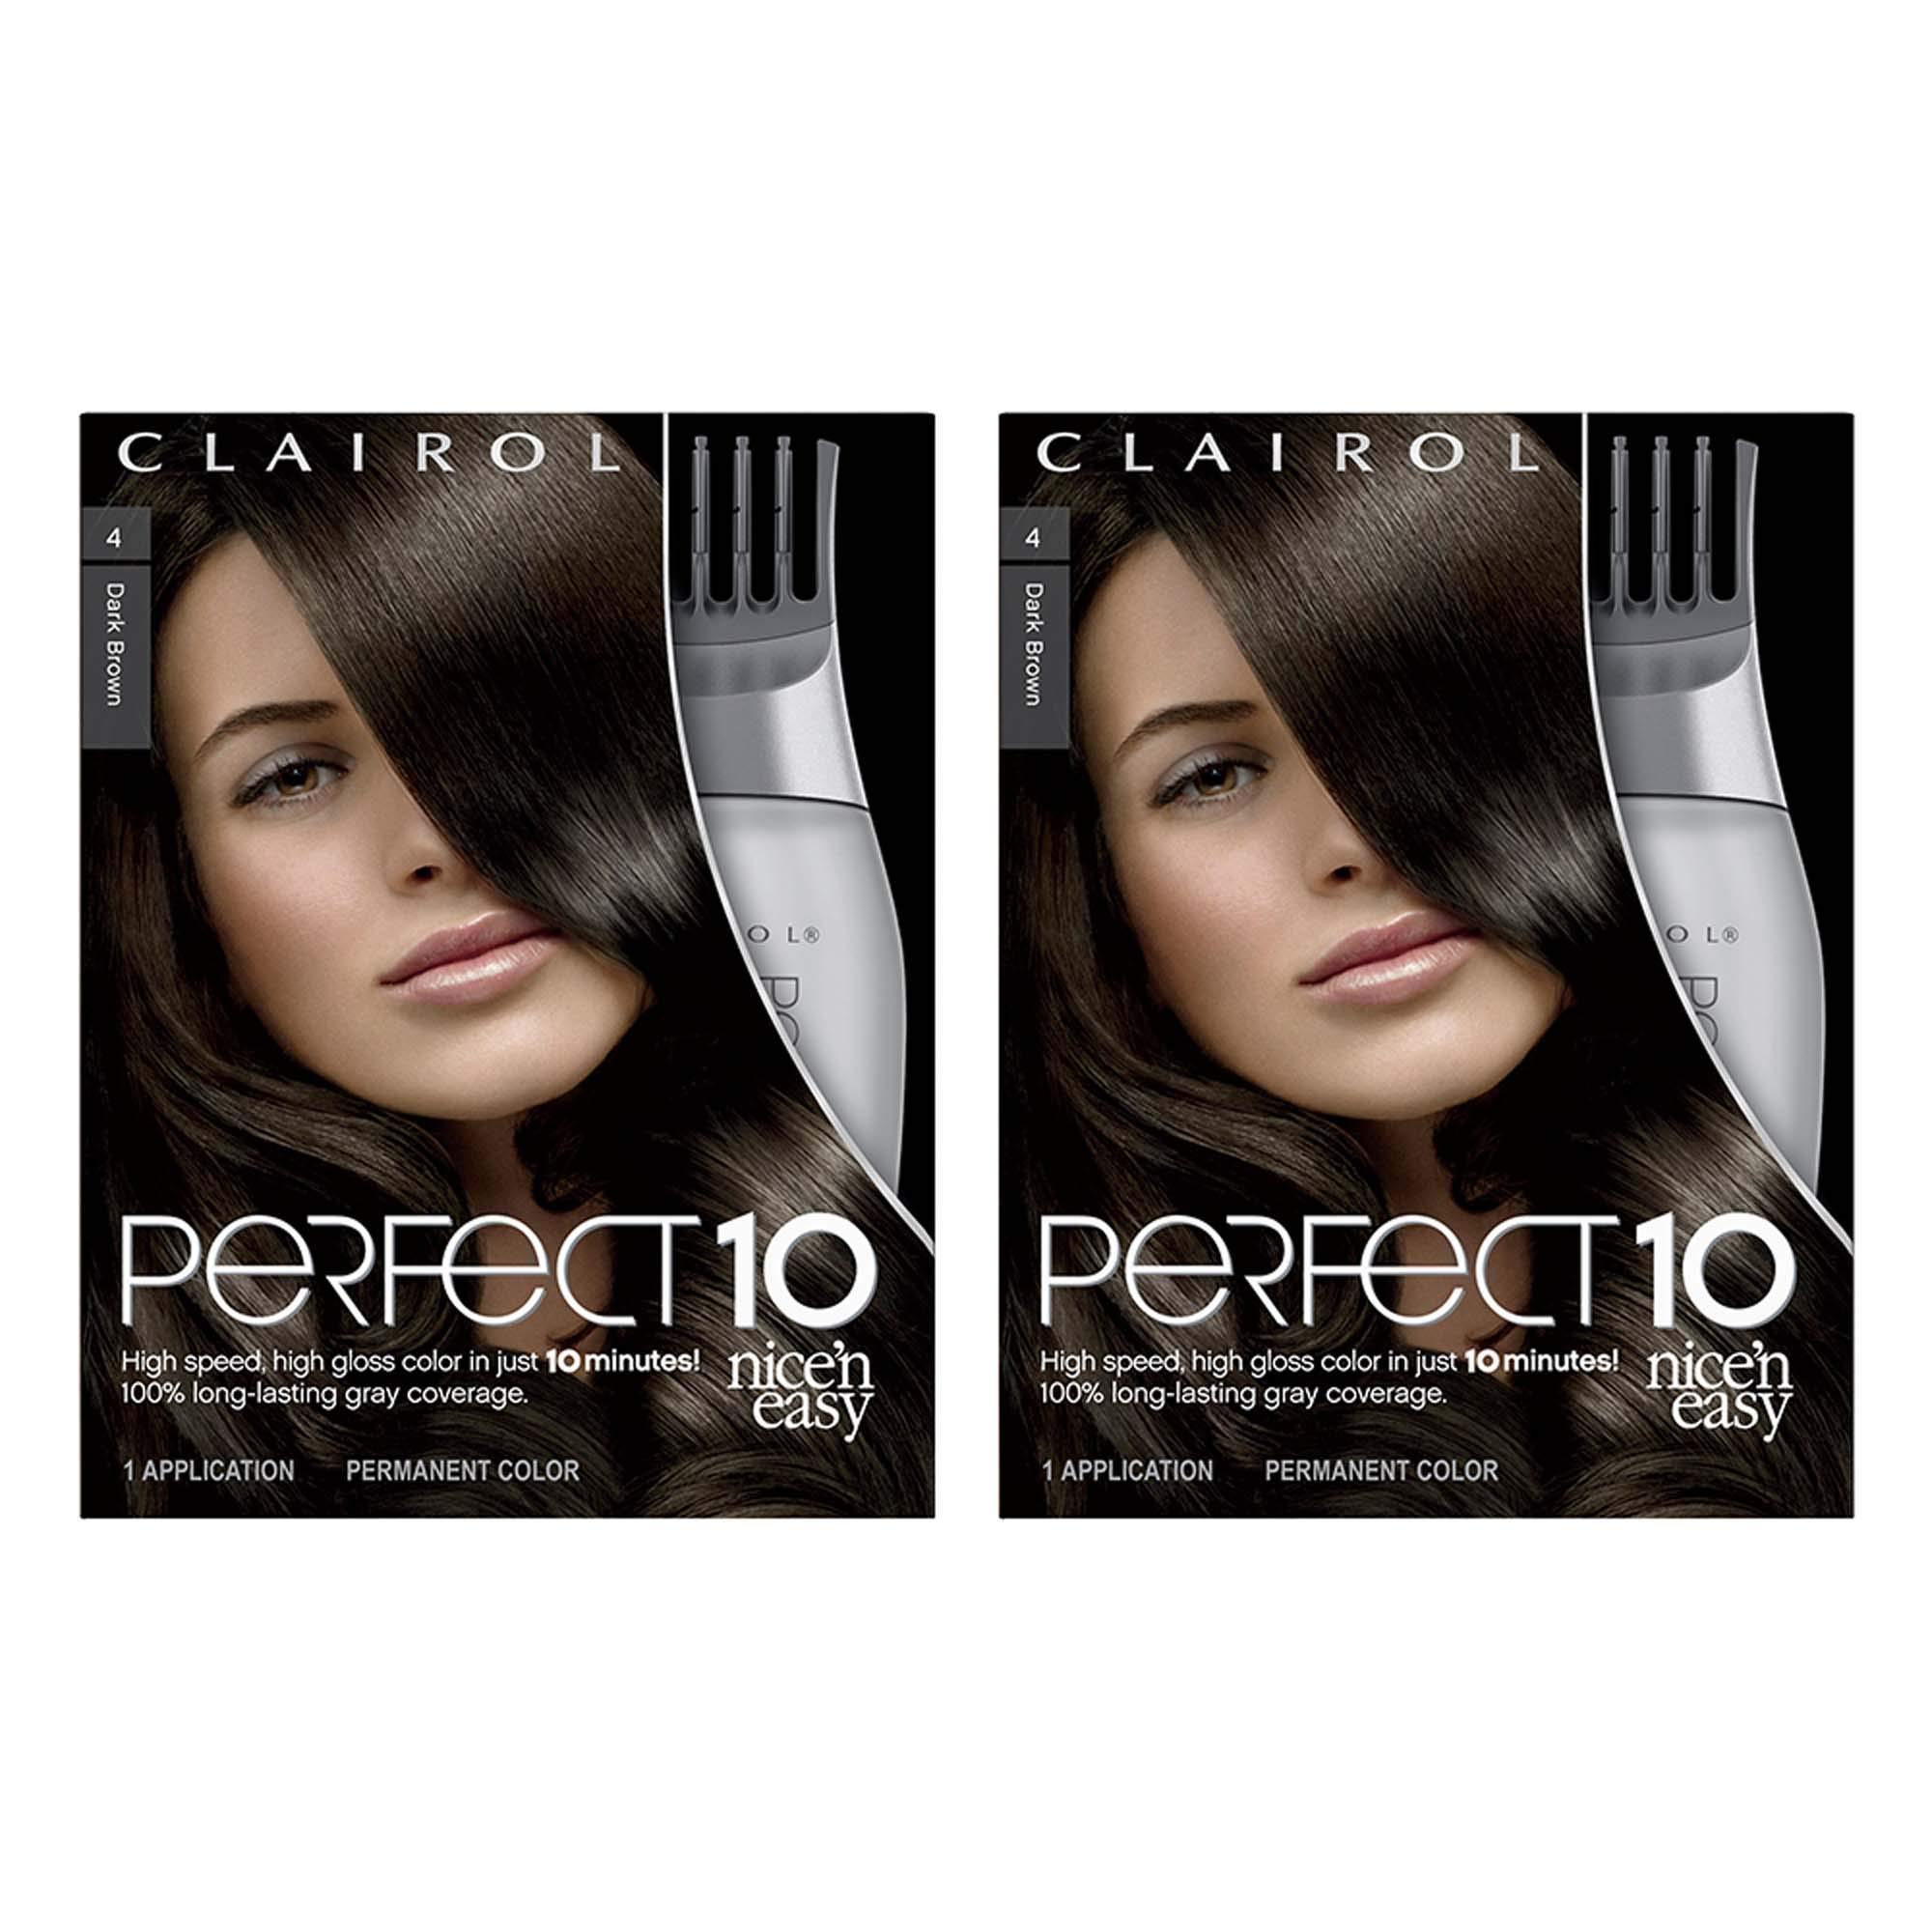 Clairol Perfect 10 By Nice 'N Easy Hair Color 004 Dark Brown 1 Kit (Pack of 2) (PACKAGING MAY VARY) by Clairol